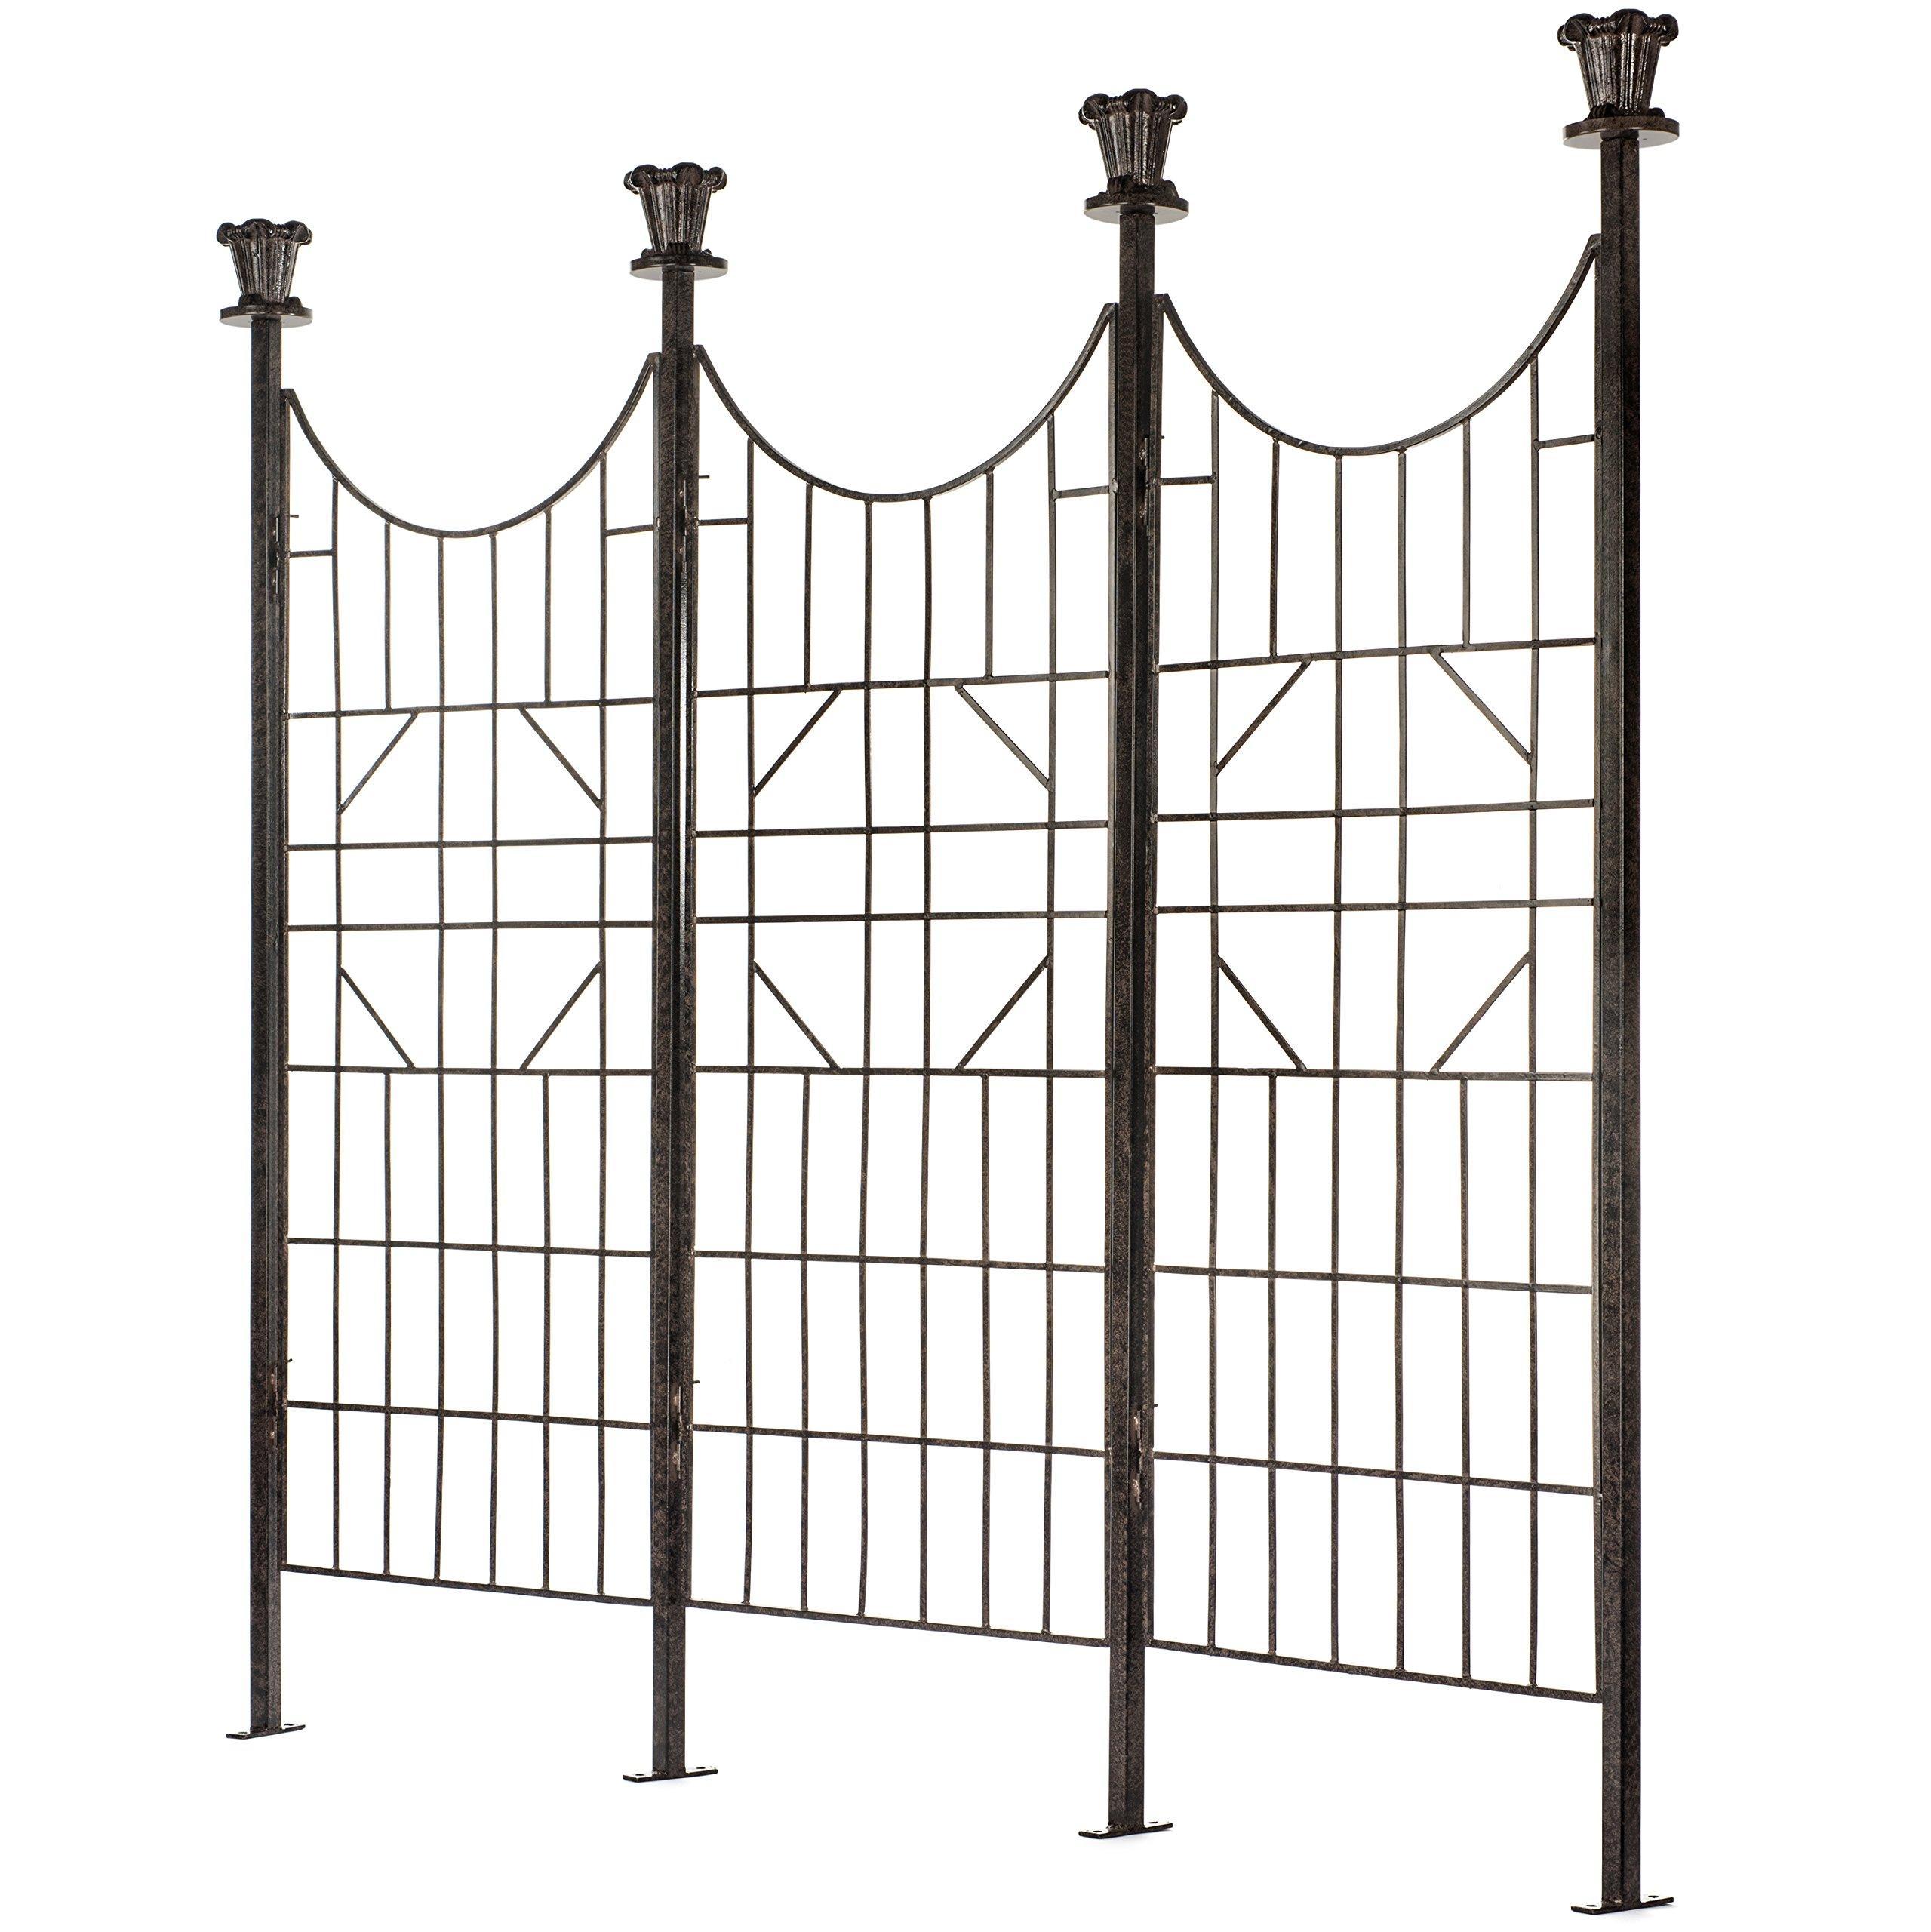 H Potter Large Iron Garden Trellis Screen/Patio Screen Fence